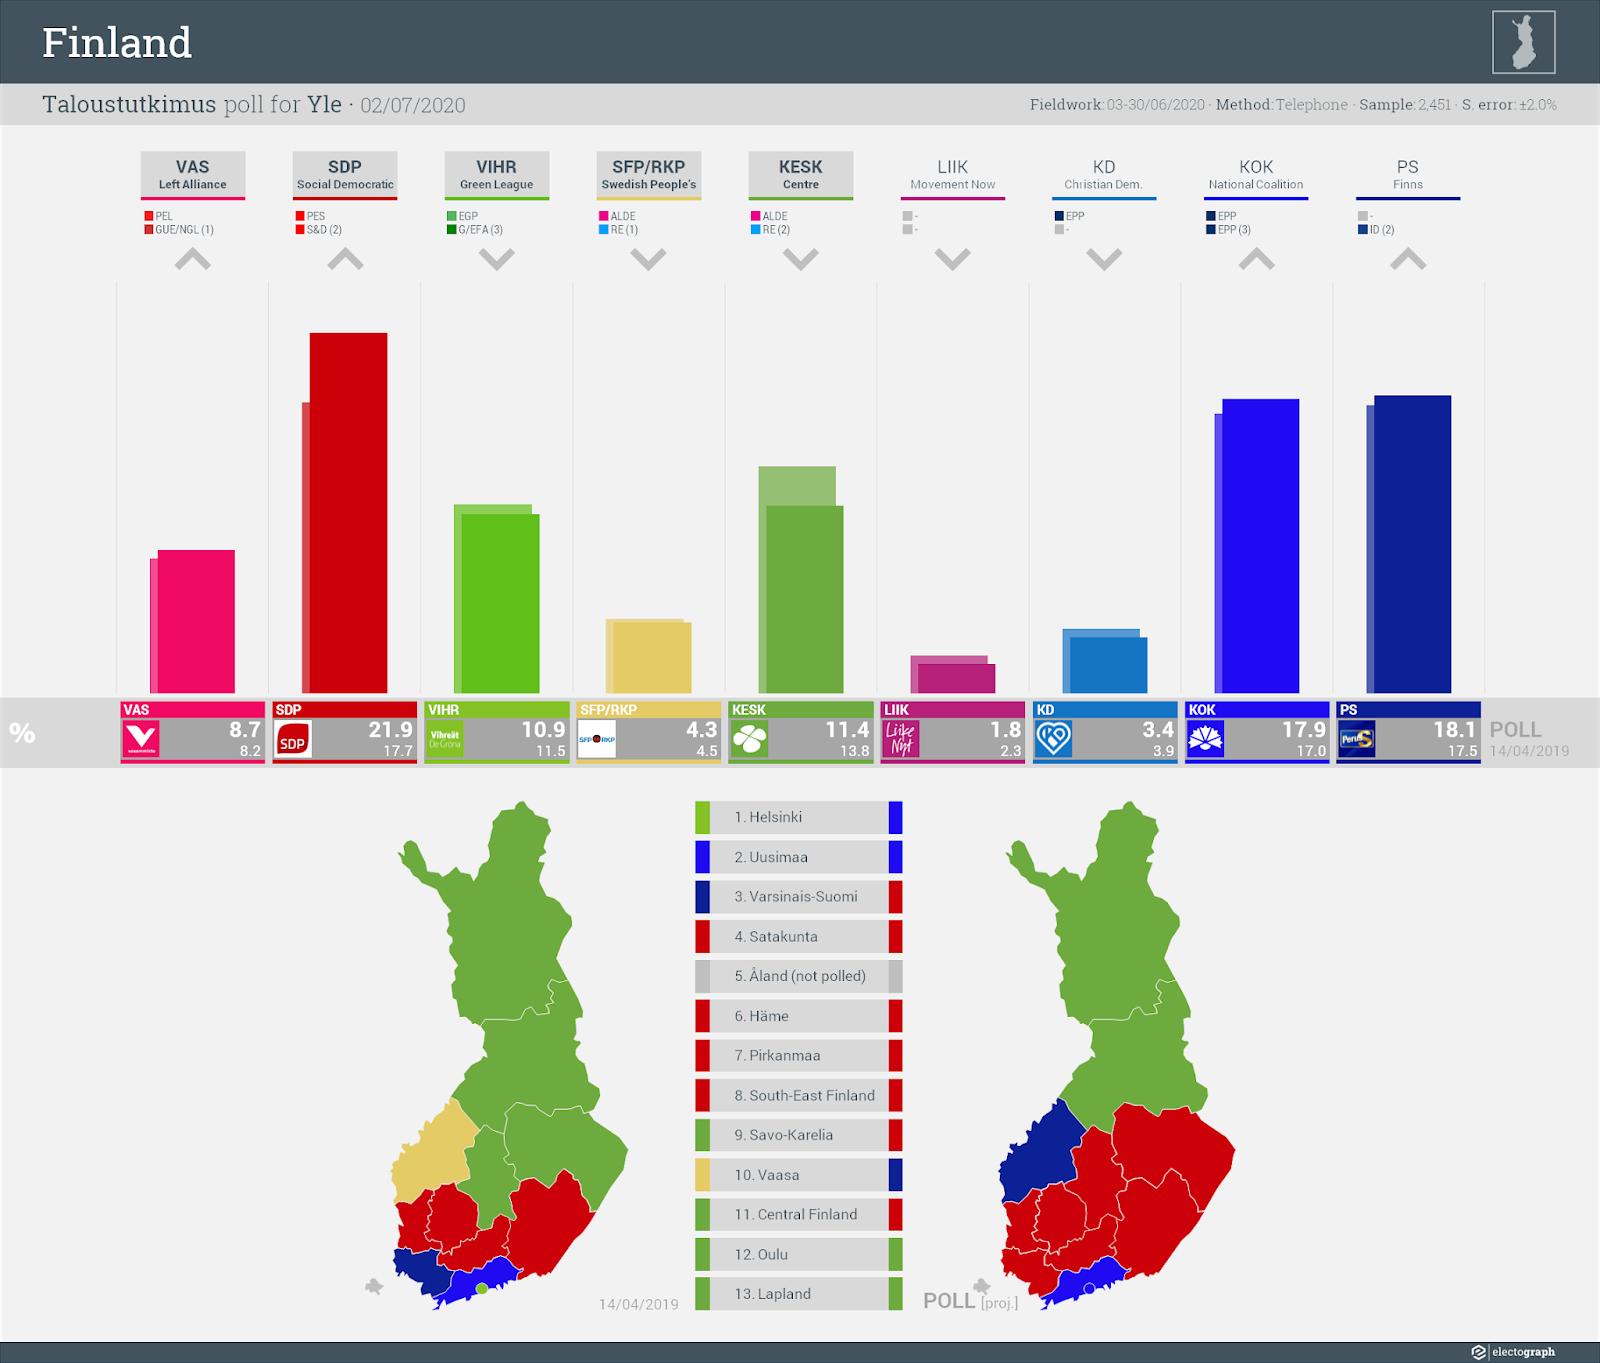 FINLAND: Taloustutkimus poll chart for Yle, 2 July 2020